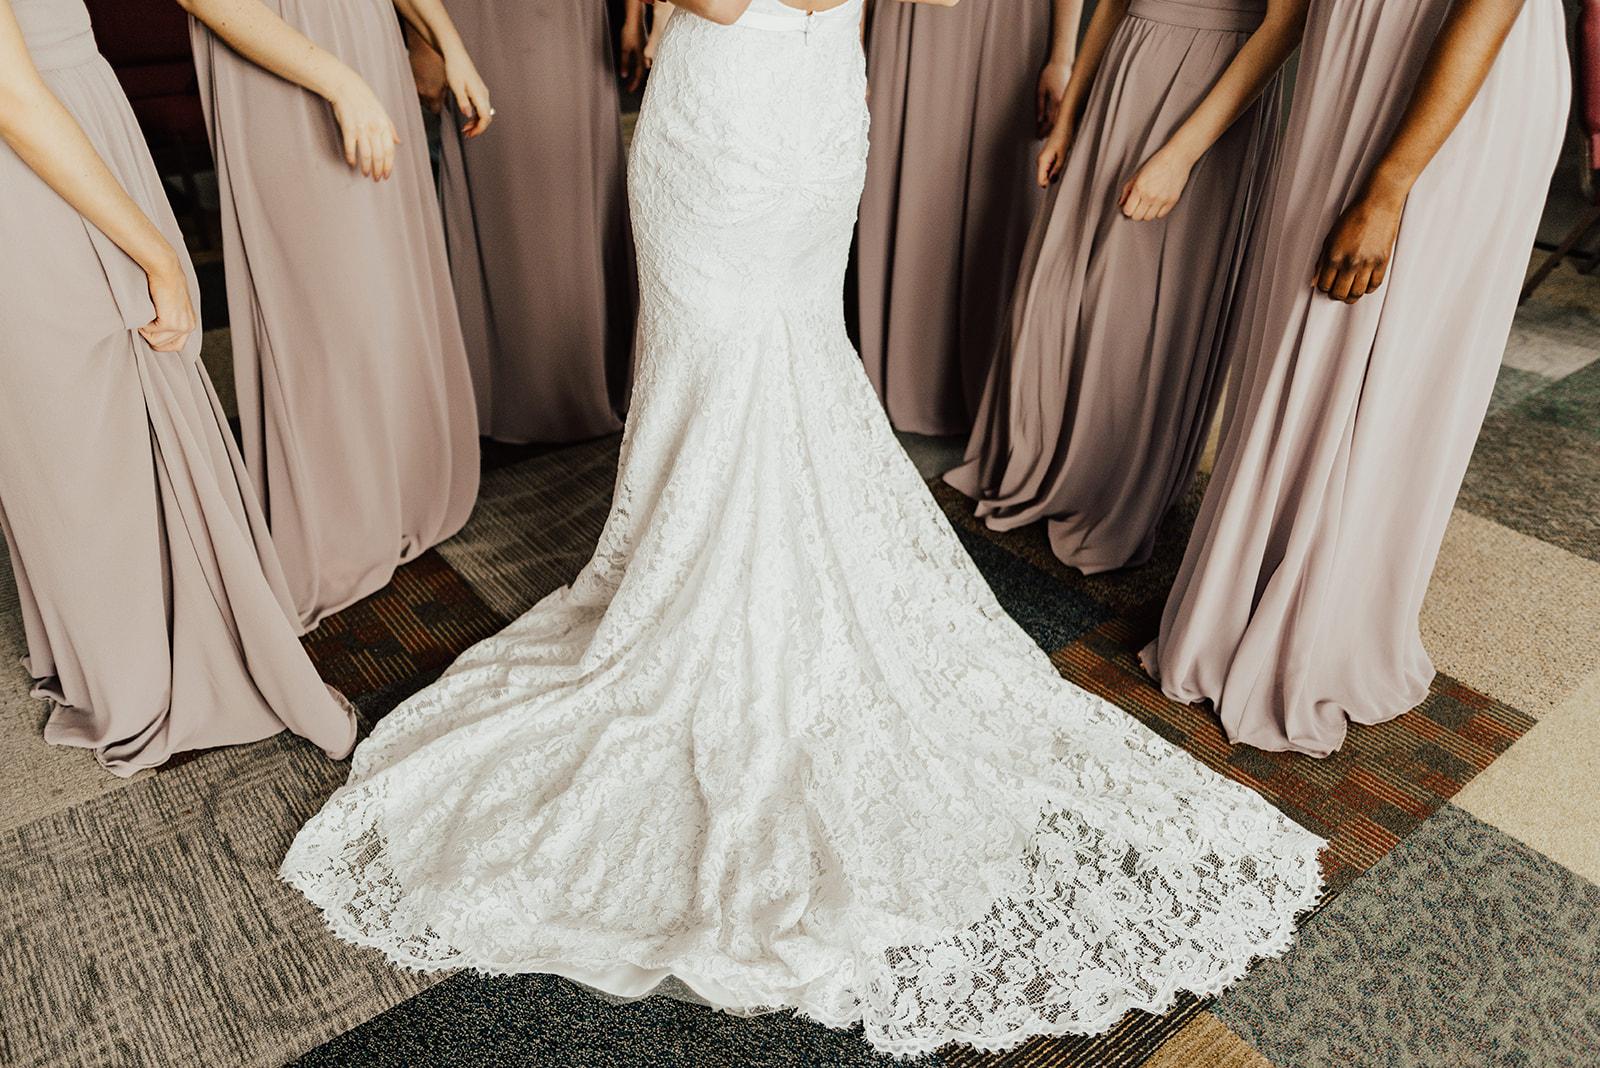 Lis Simon Bridesmaids Dresses